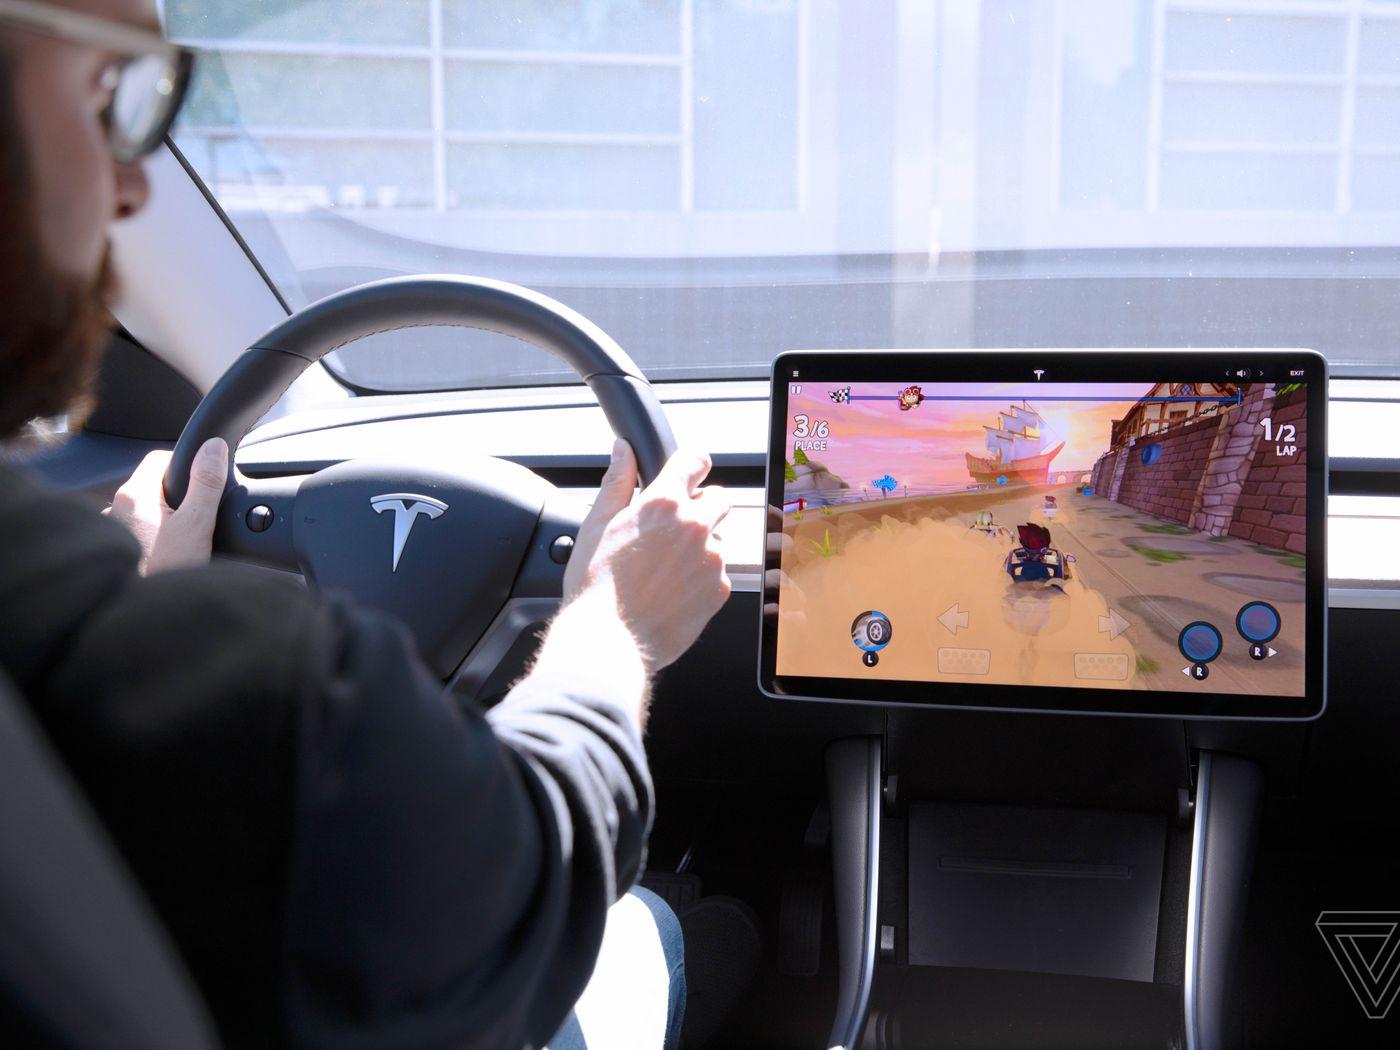 Tesla Arcade hands-on: using a Model 3 steering wheel as a